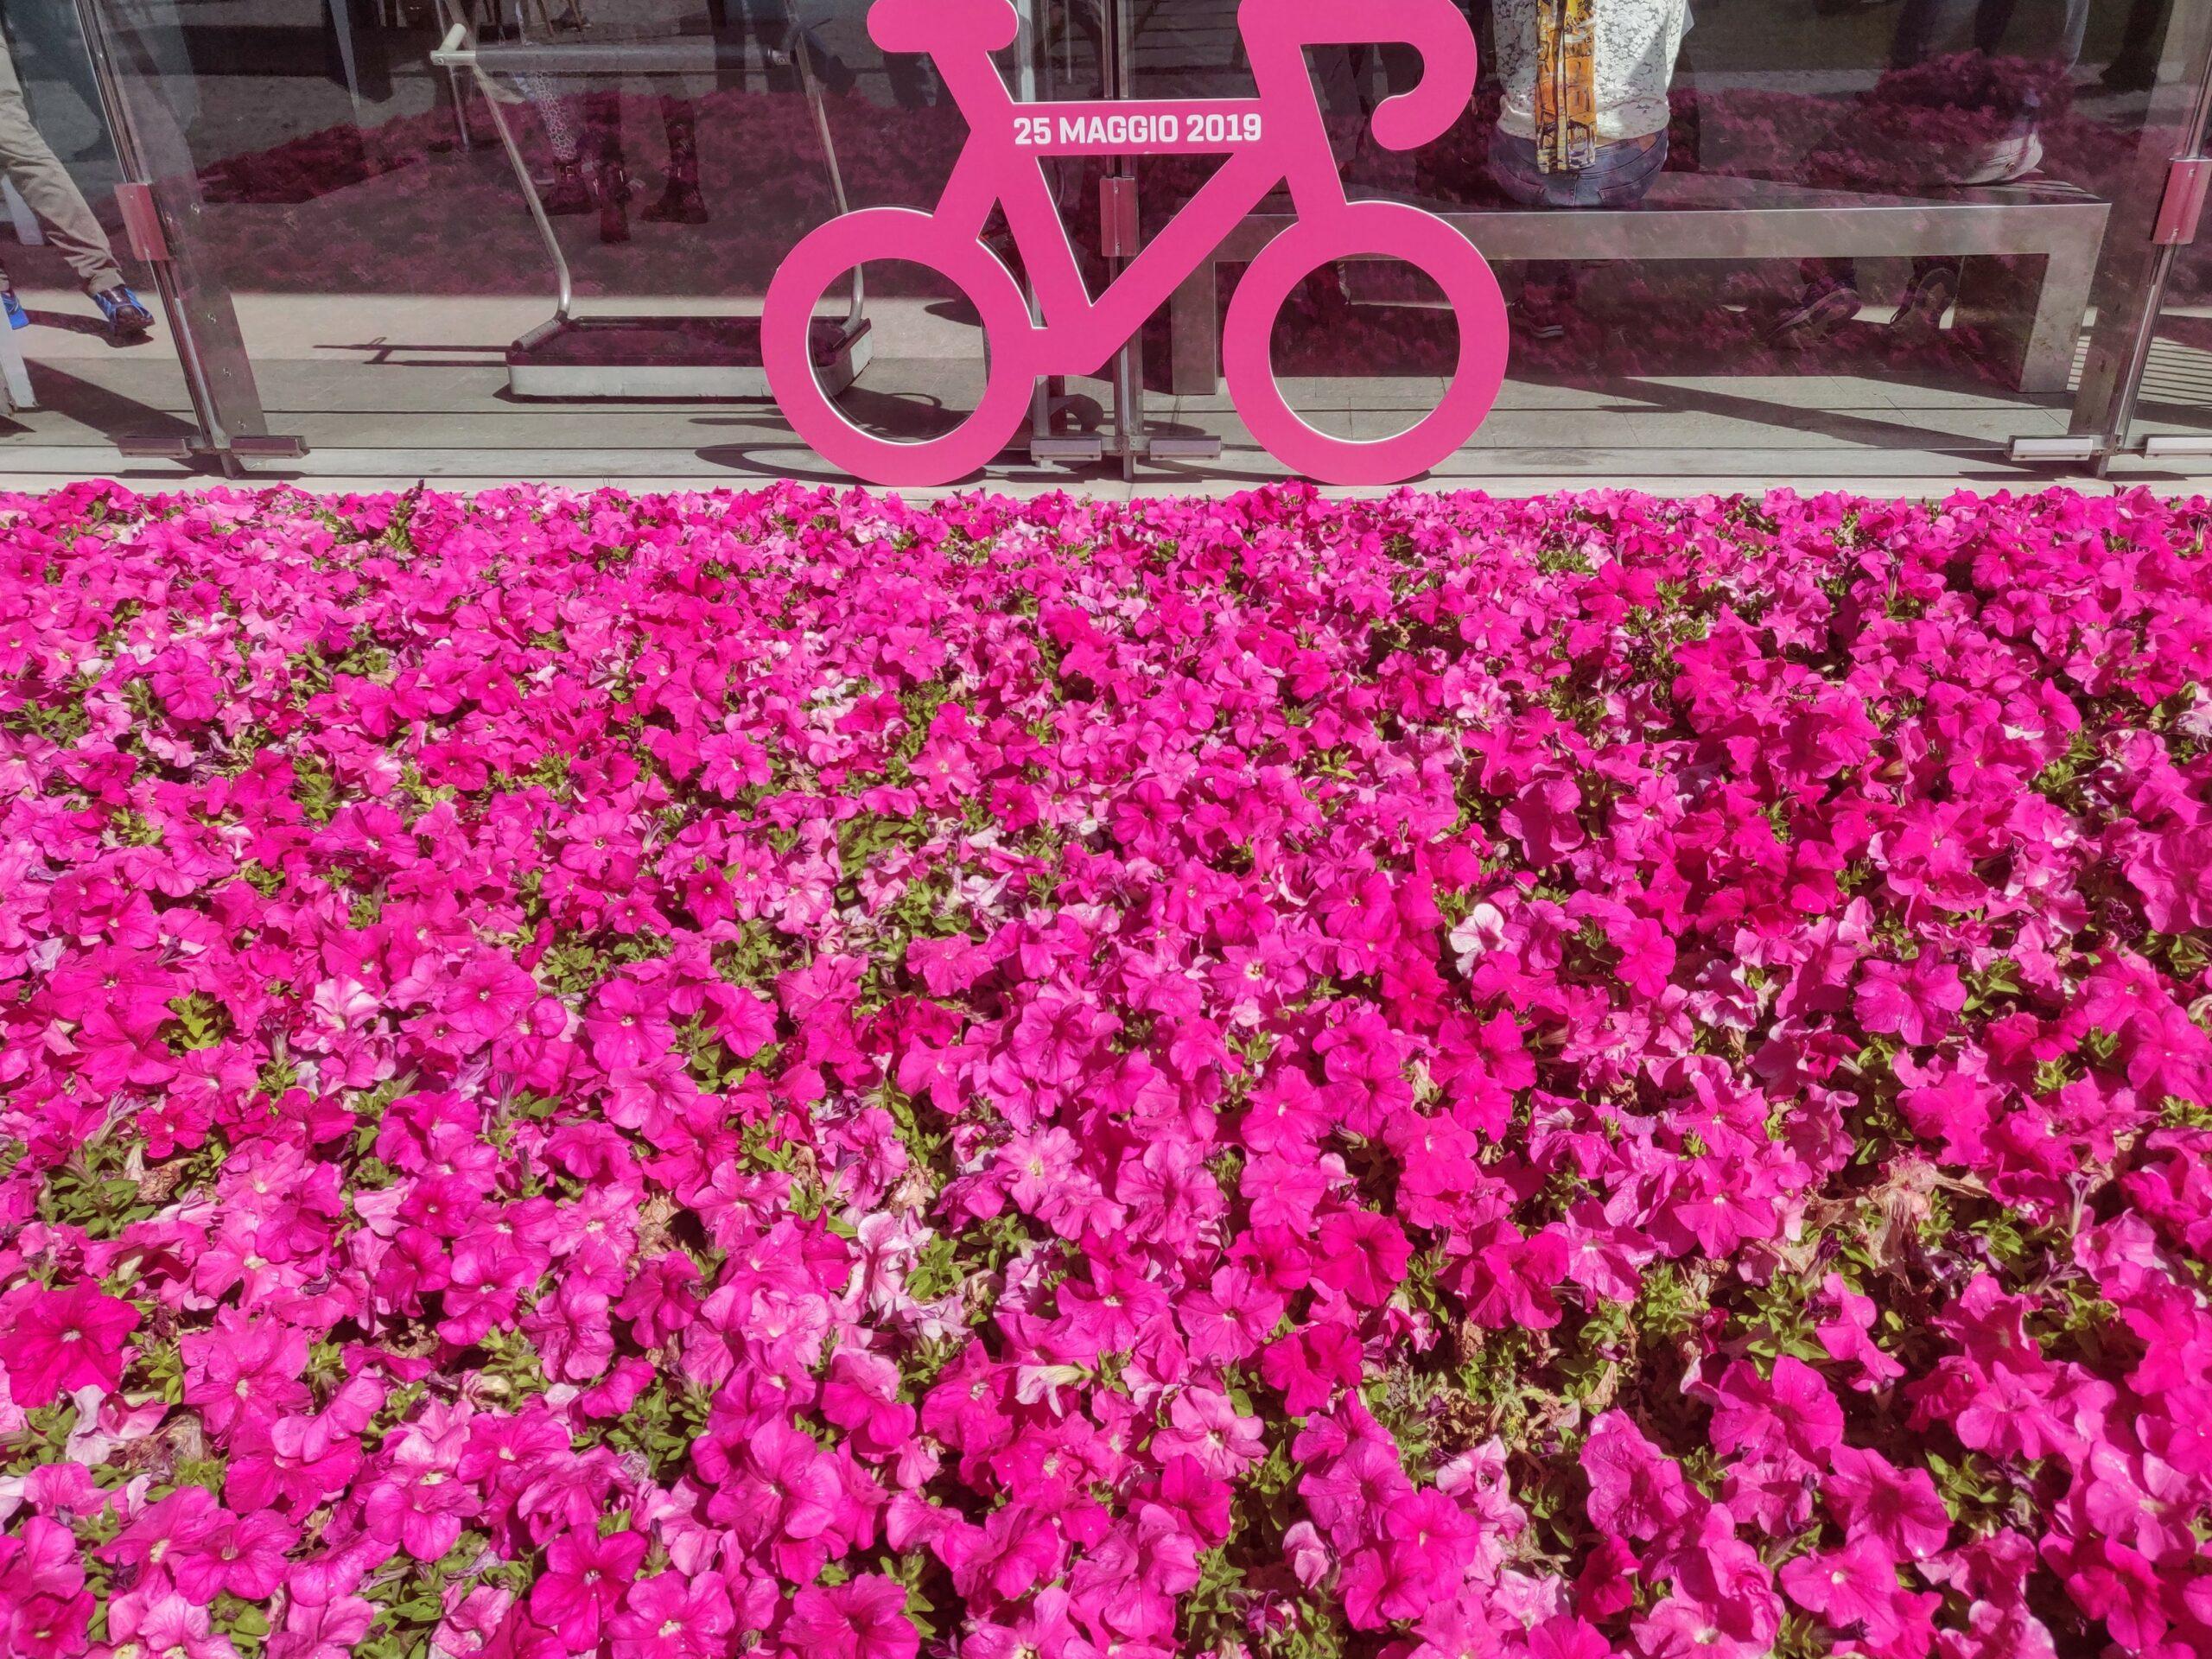 Val D'Aosta - Giro - Pink bicycle - bike pink flower - flower field and bike